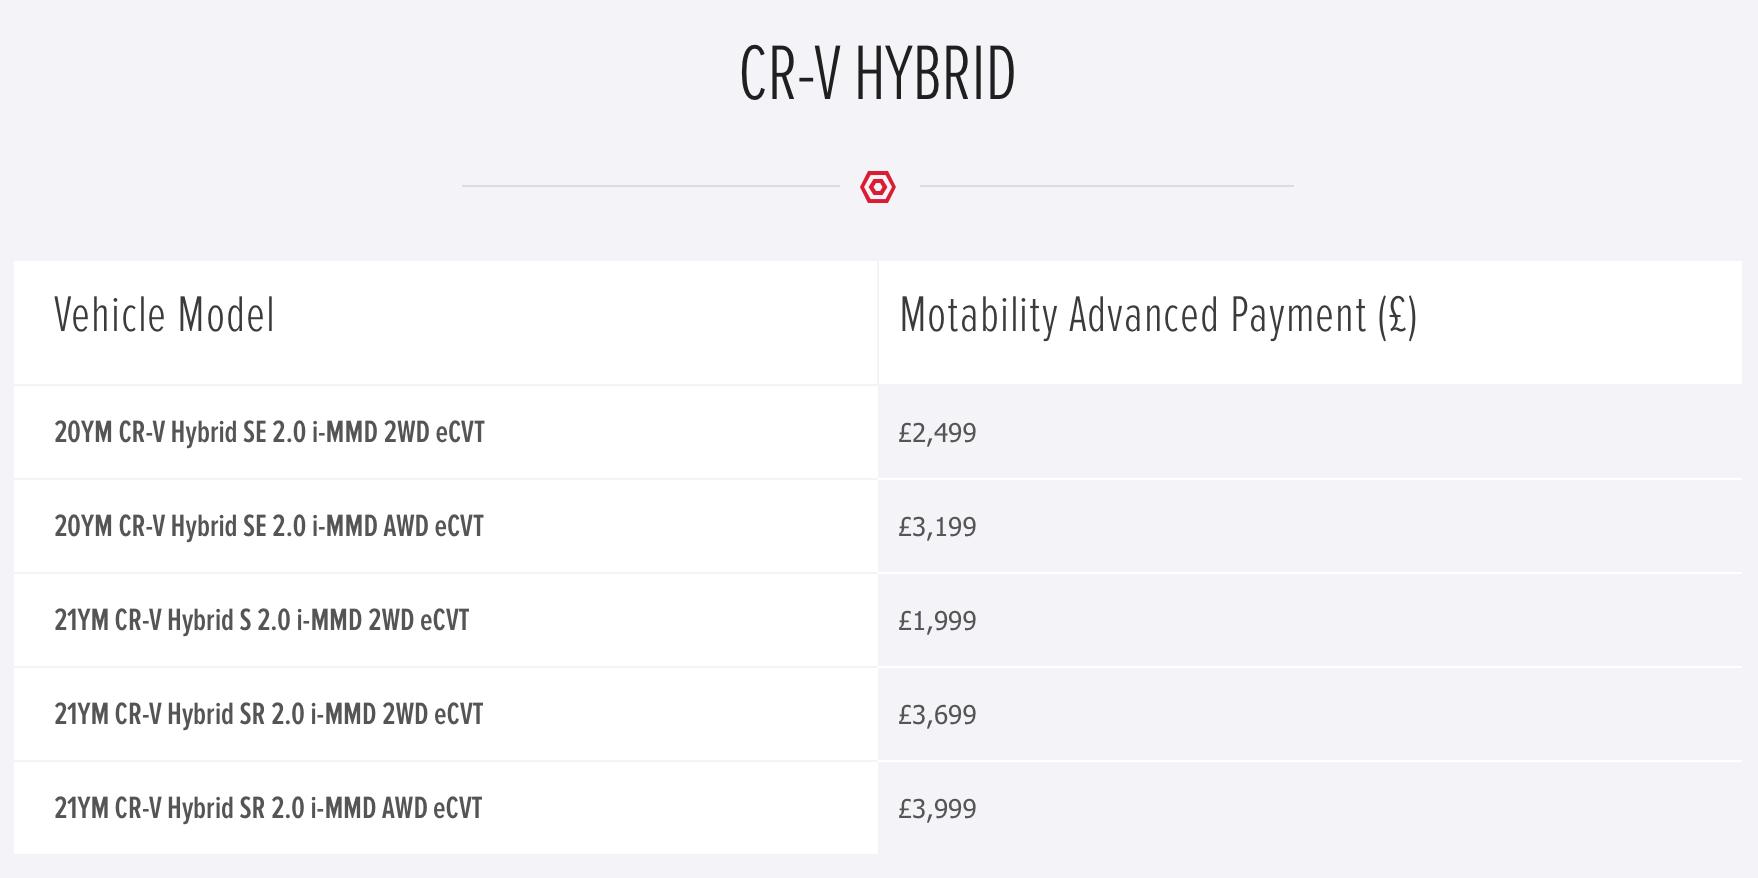 honda-crvhybrid-motab-prices-jan2021.png